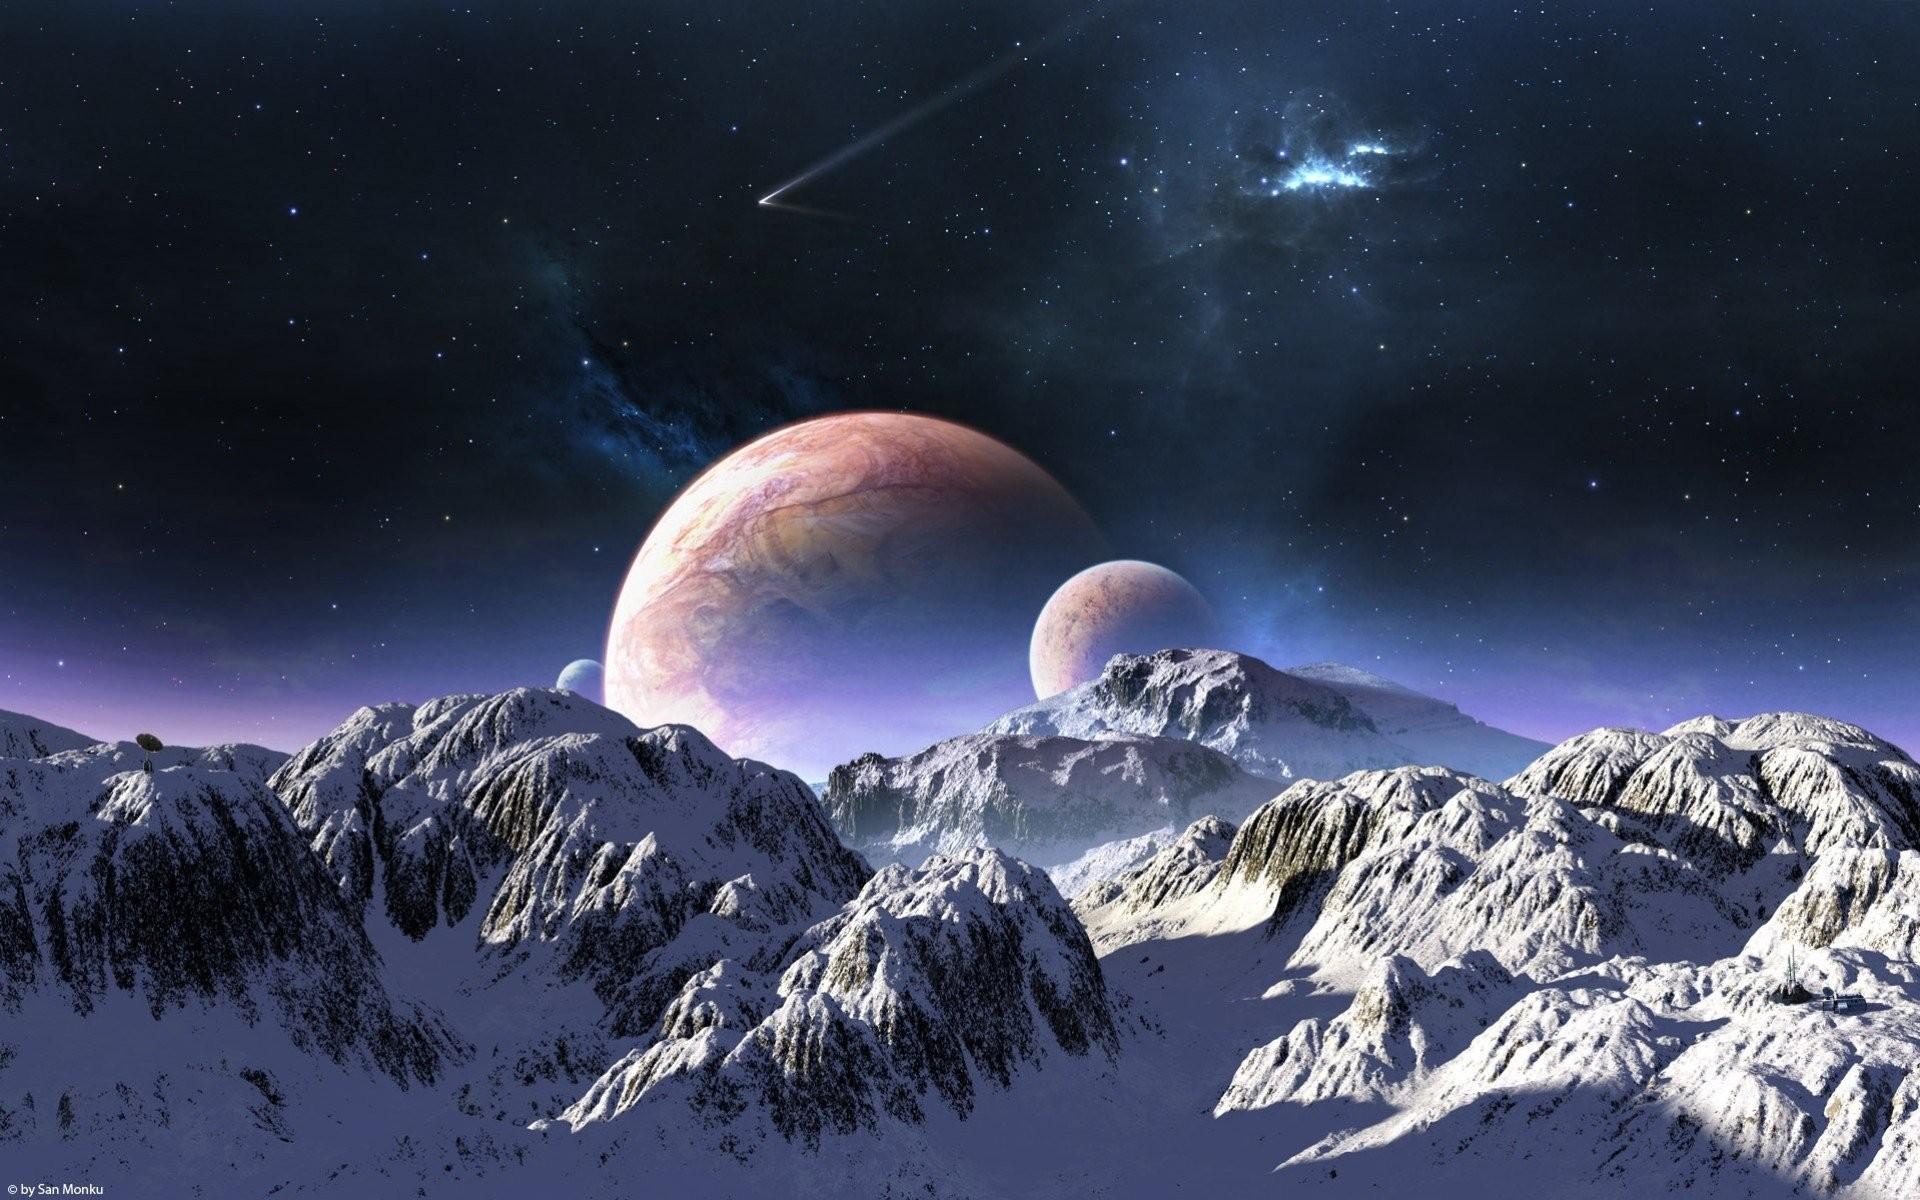 planet terraspace comet sky snow mountain